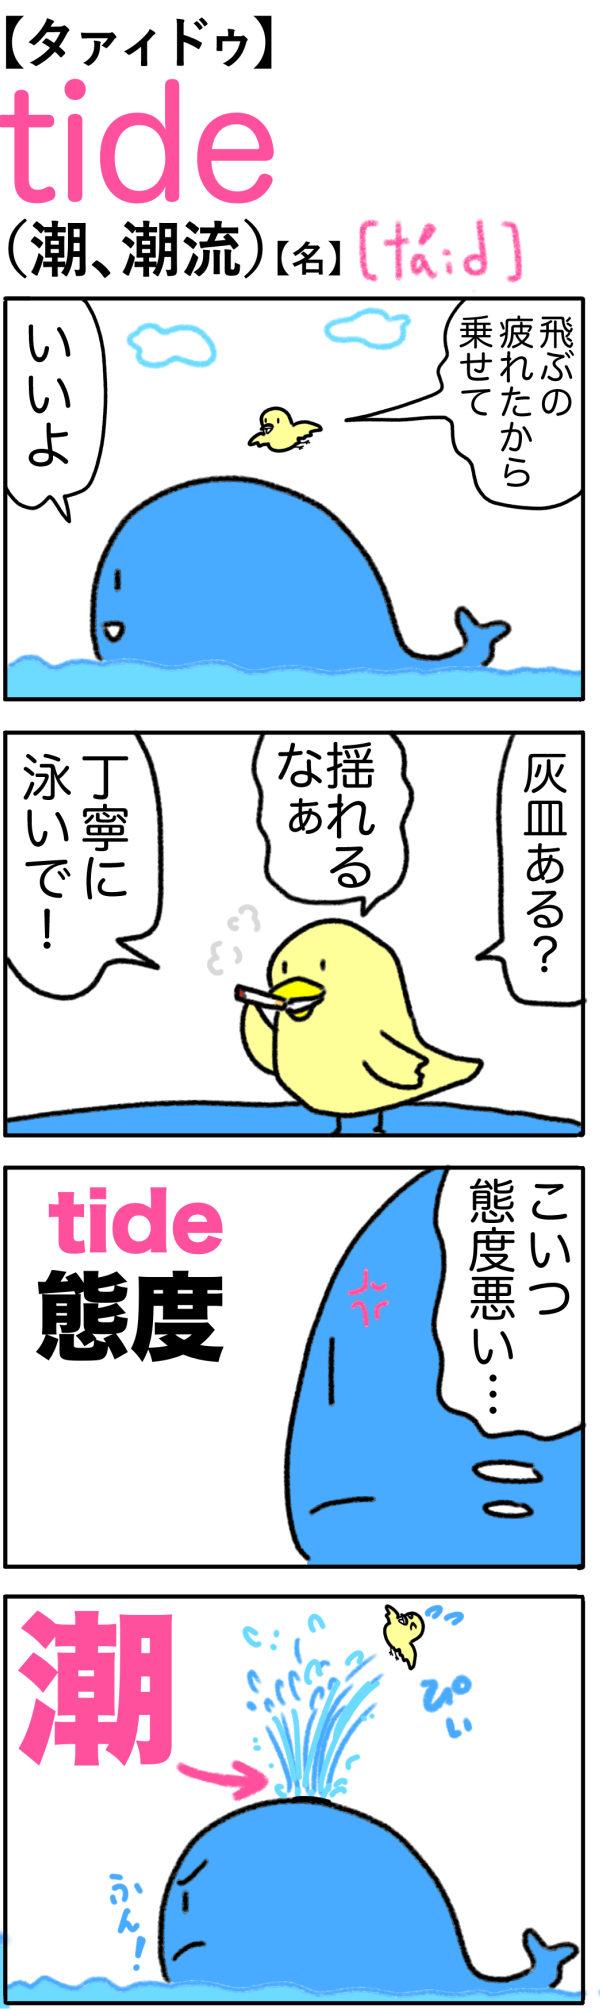 tide(潮)の語呂合わせ英単語